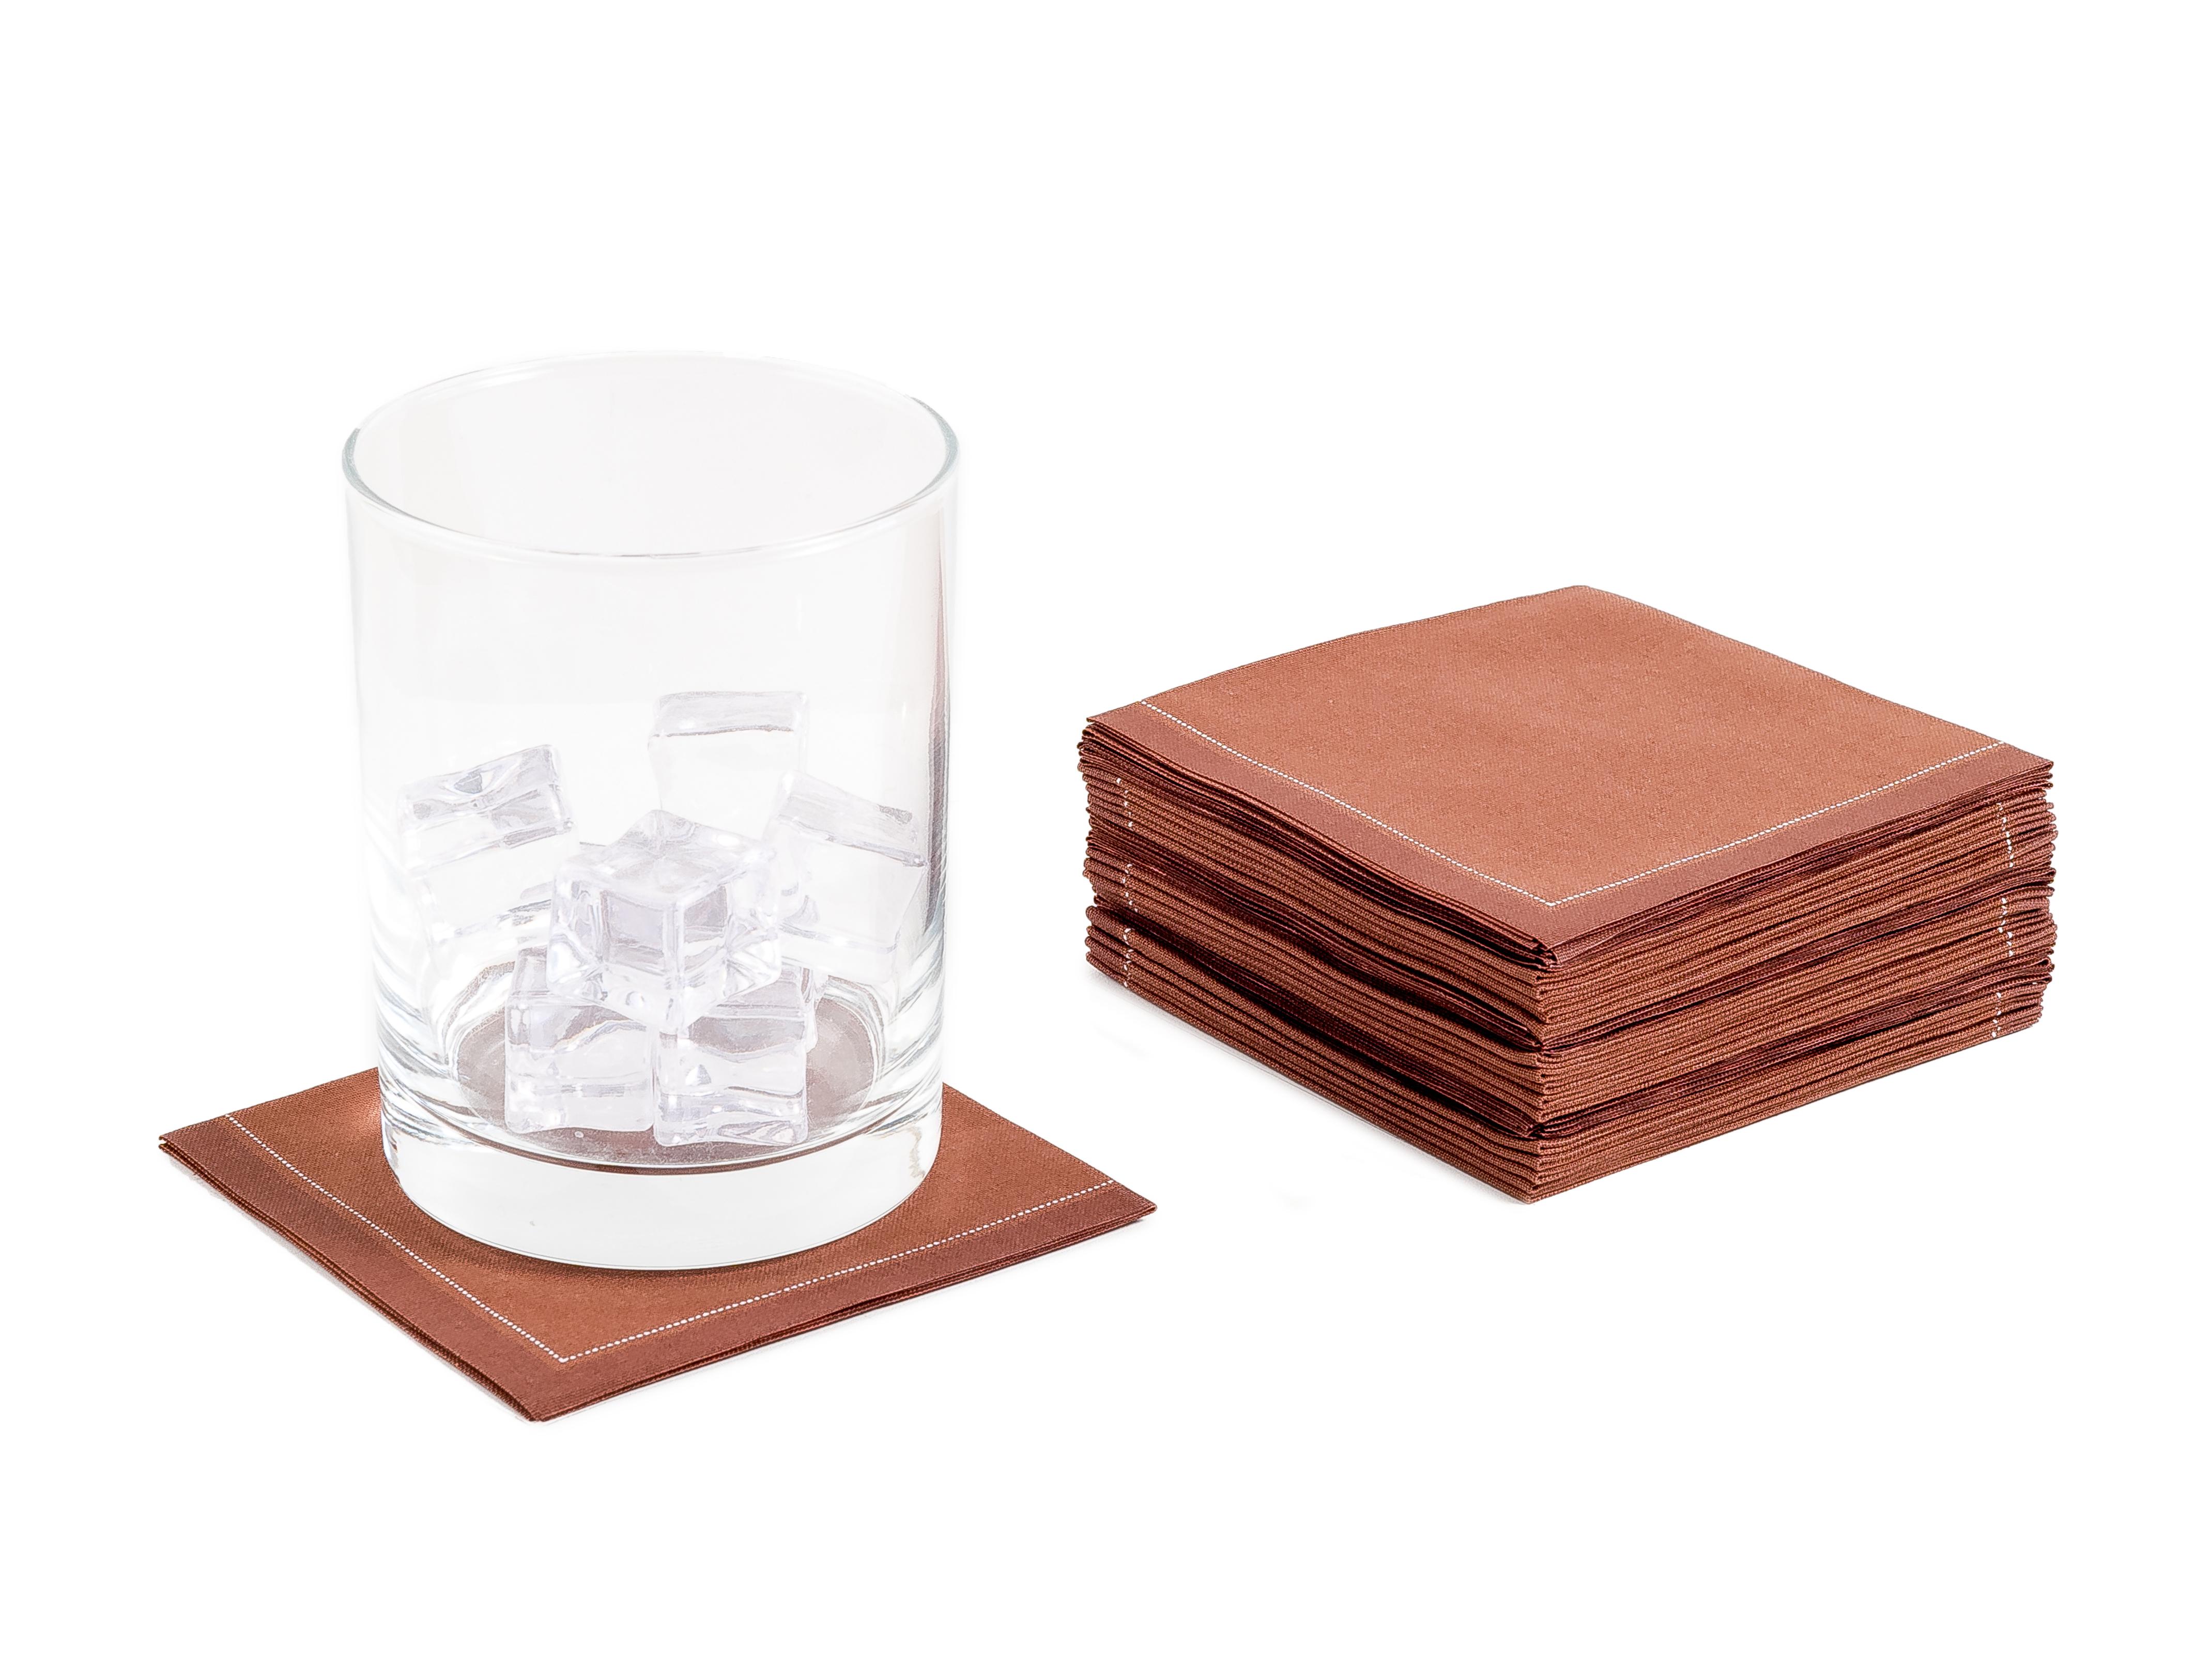 "Friar Brown Cotton 1/4 Fold Cocktail - 8"" x 8"" (folded 4"" x 4"") - 30 units"